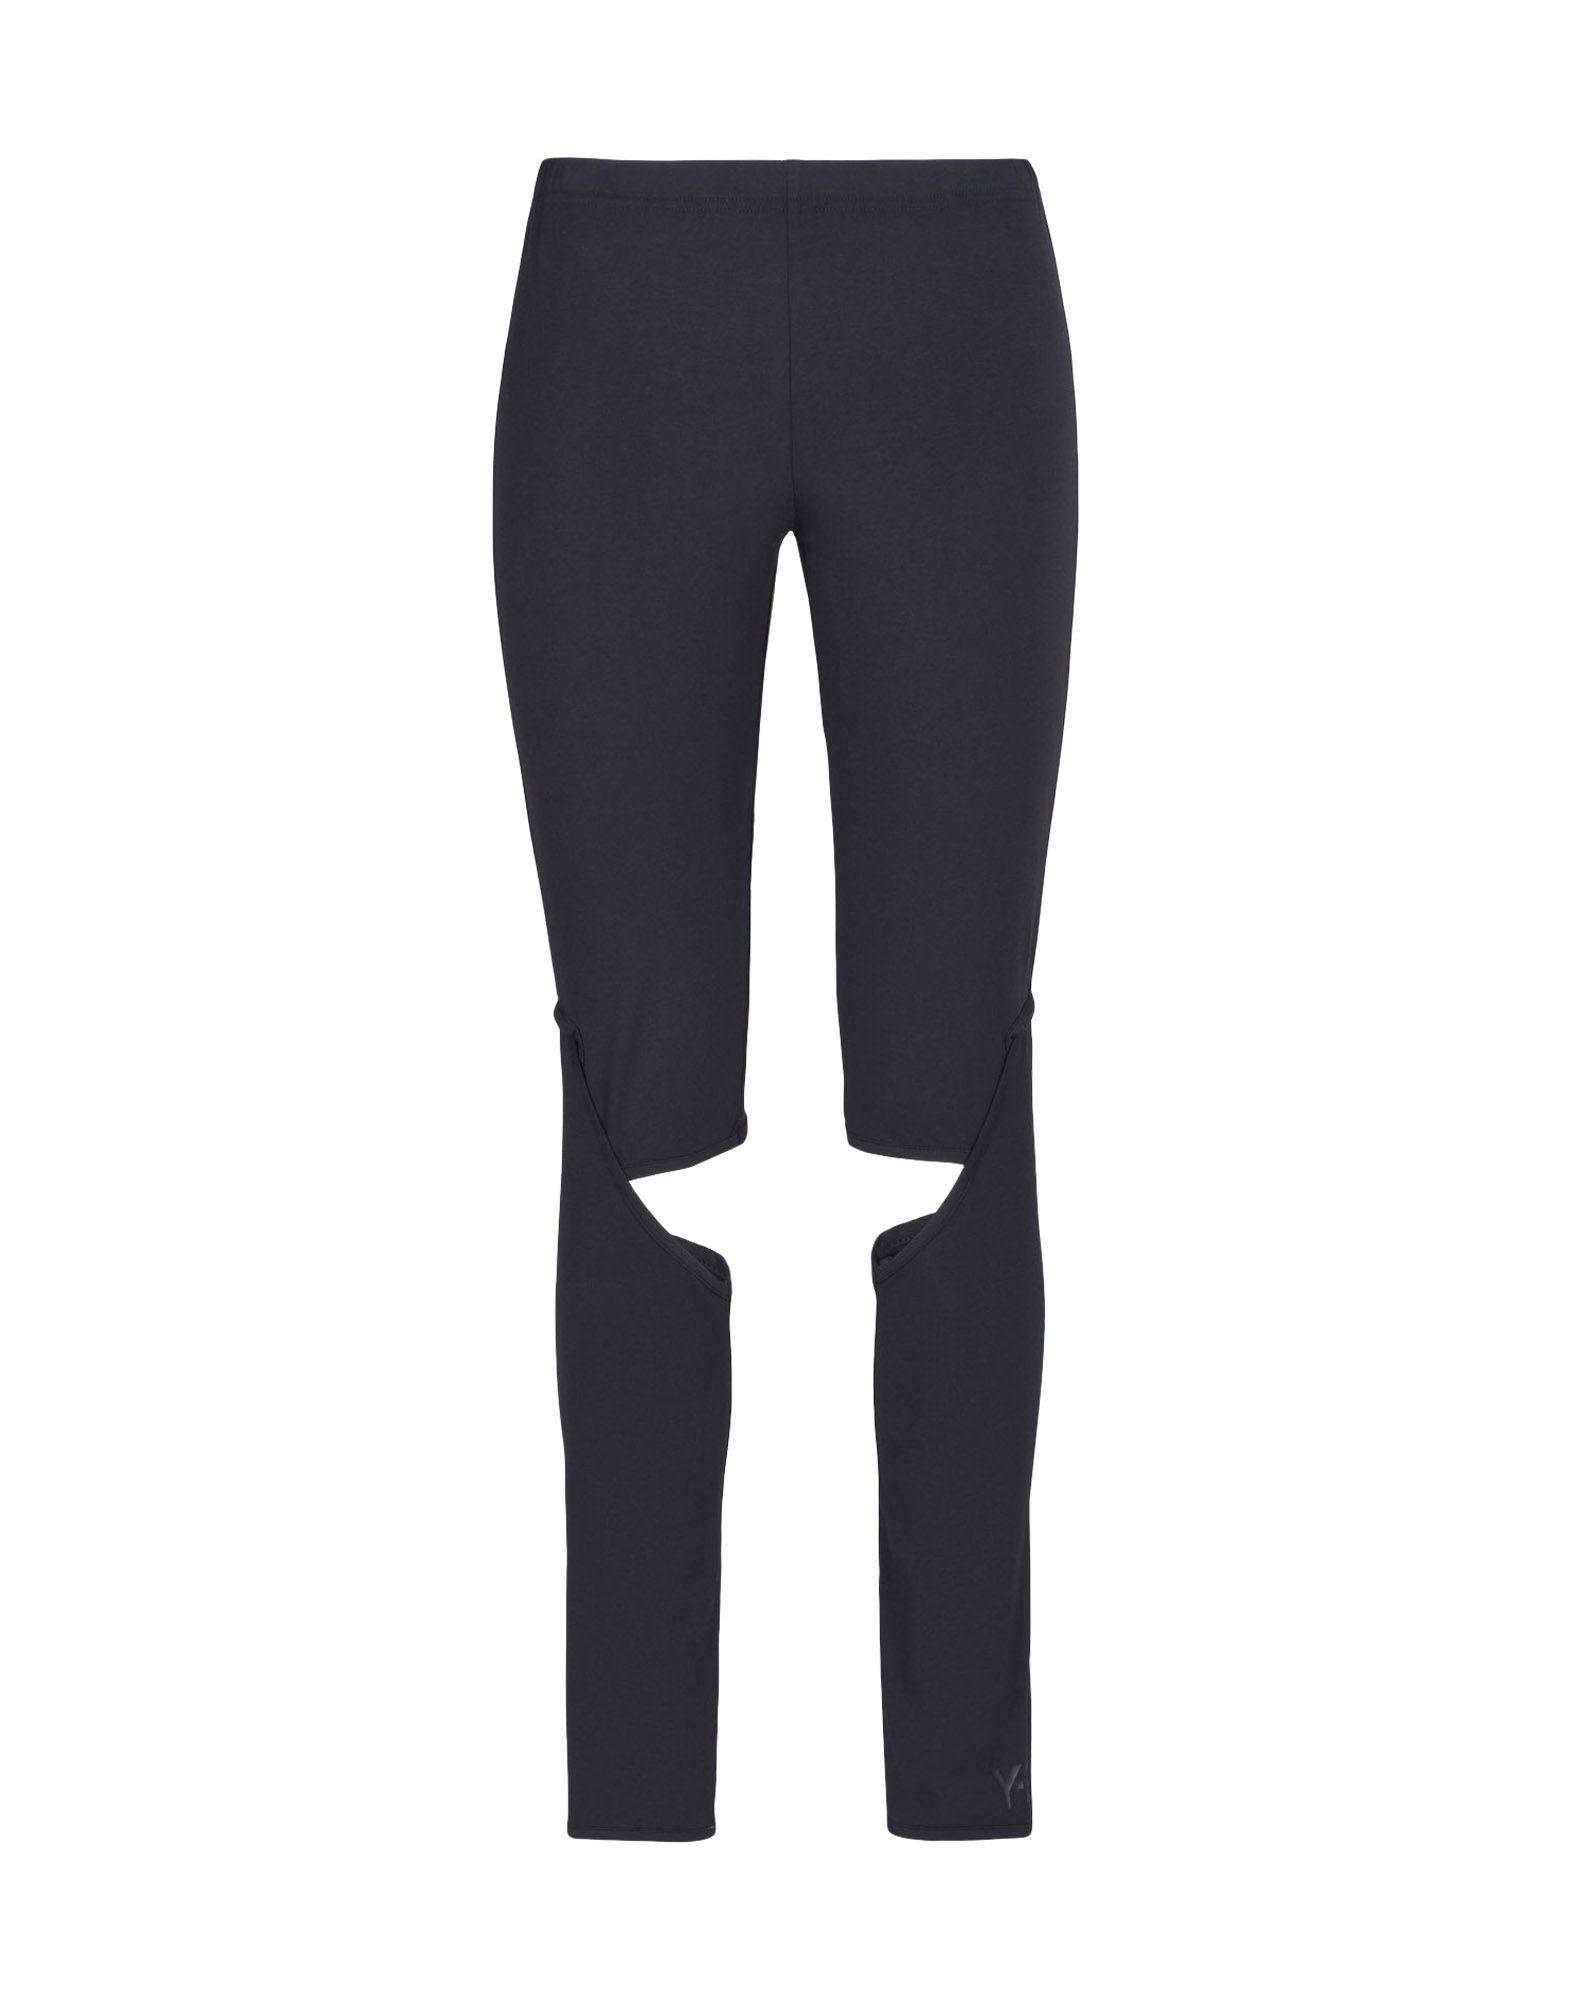 Y-3 NOMADIC JSY LEGGING PANTS woman Y-3 adidas